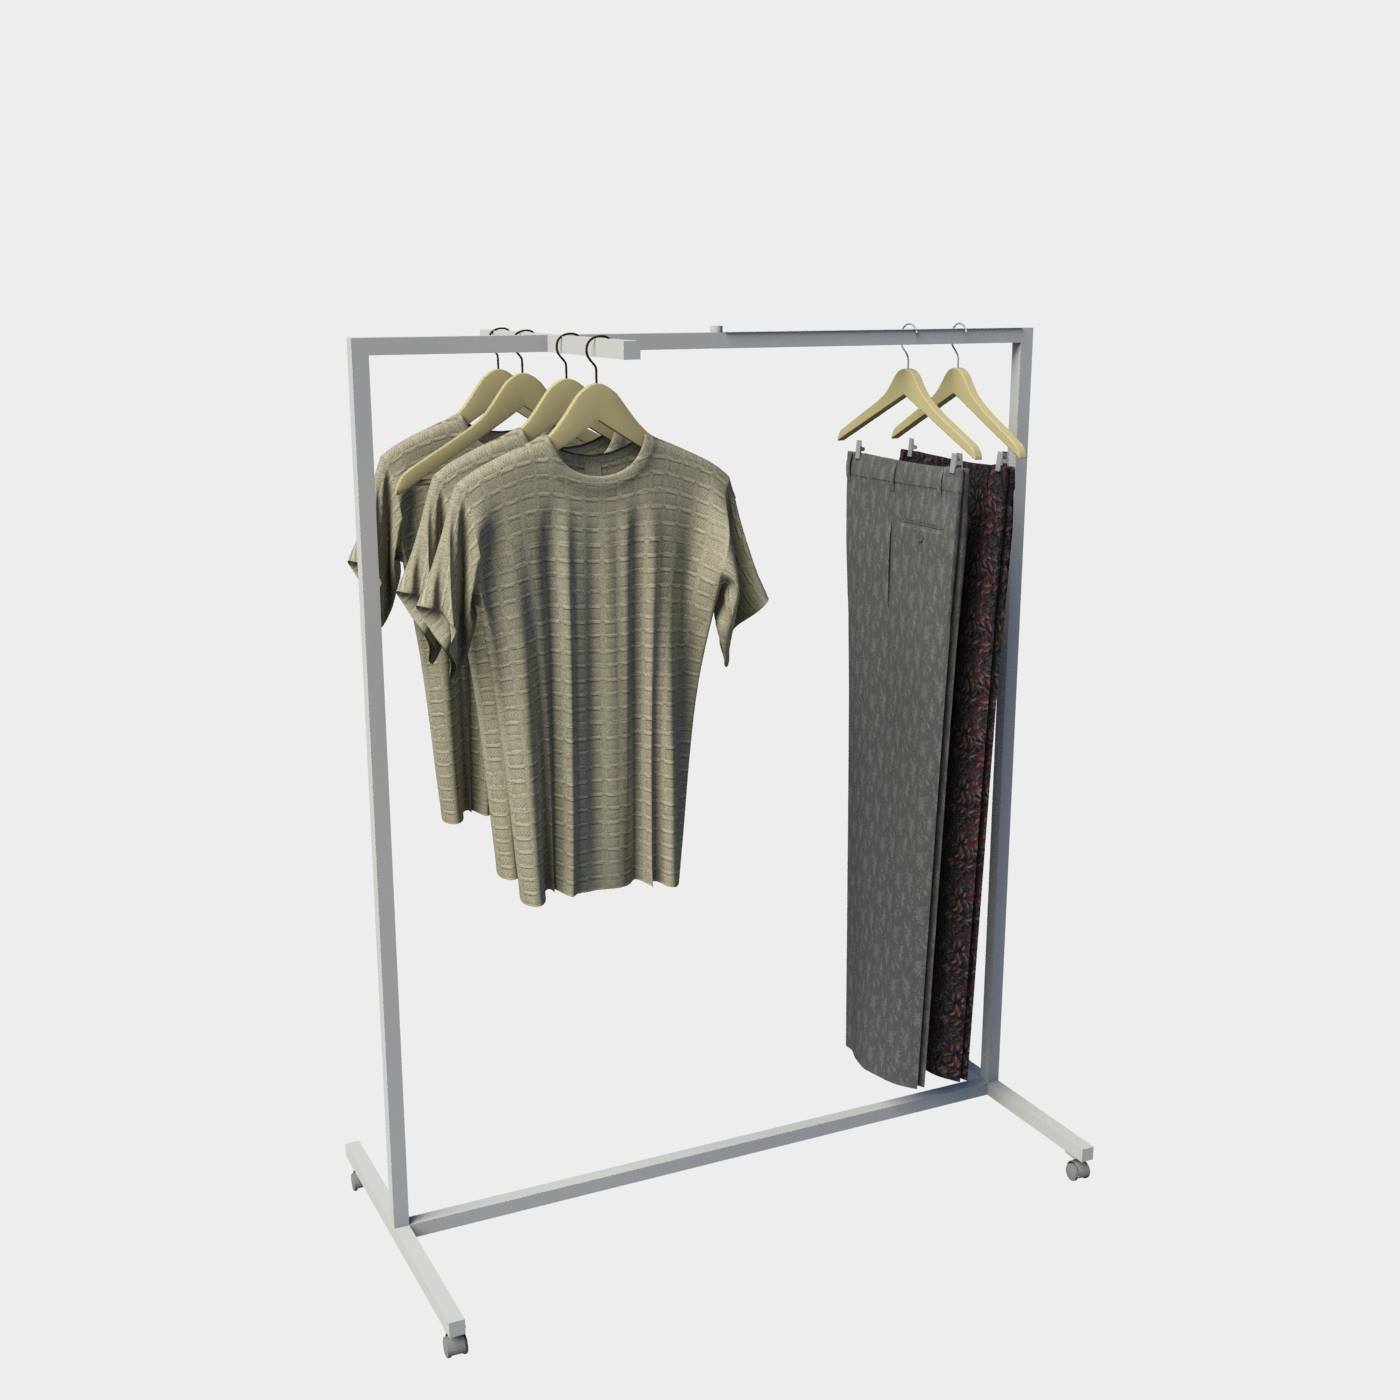 62664c46e27 Stand επιδαπέδιο ρούχων καταστημάτων έπιπλα καταστήματος διακόσμηση  εξοπλισμός ένδυσης